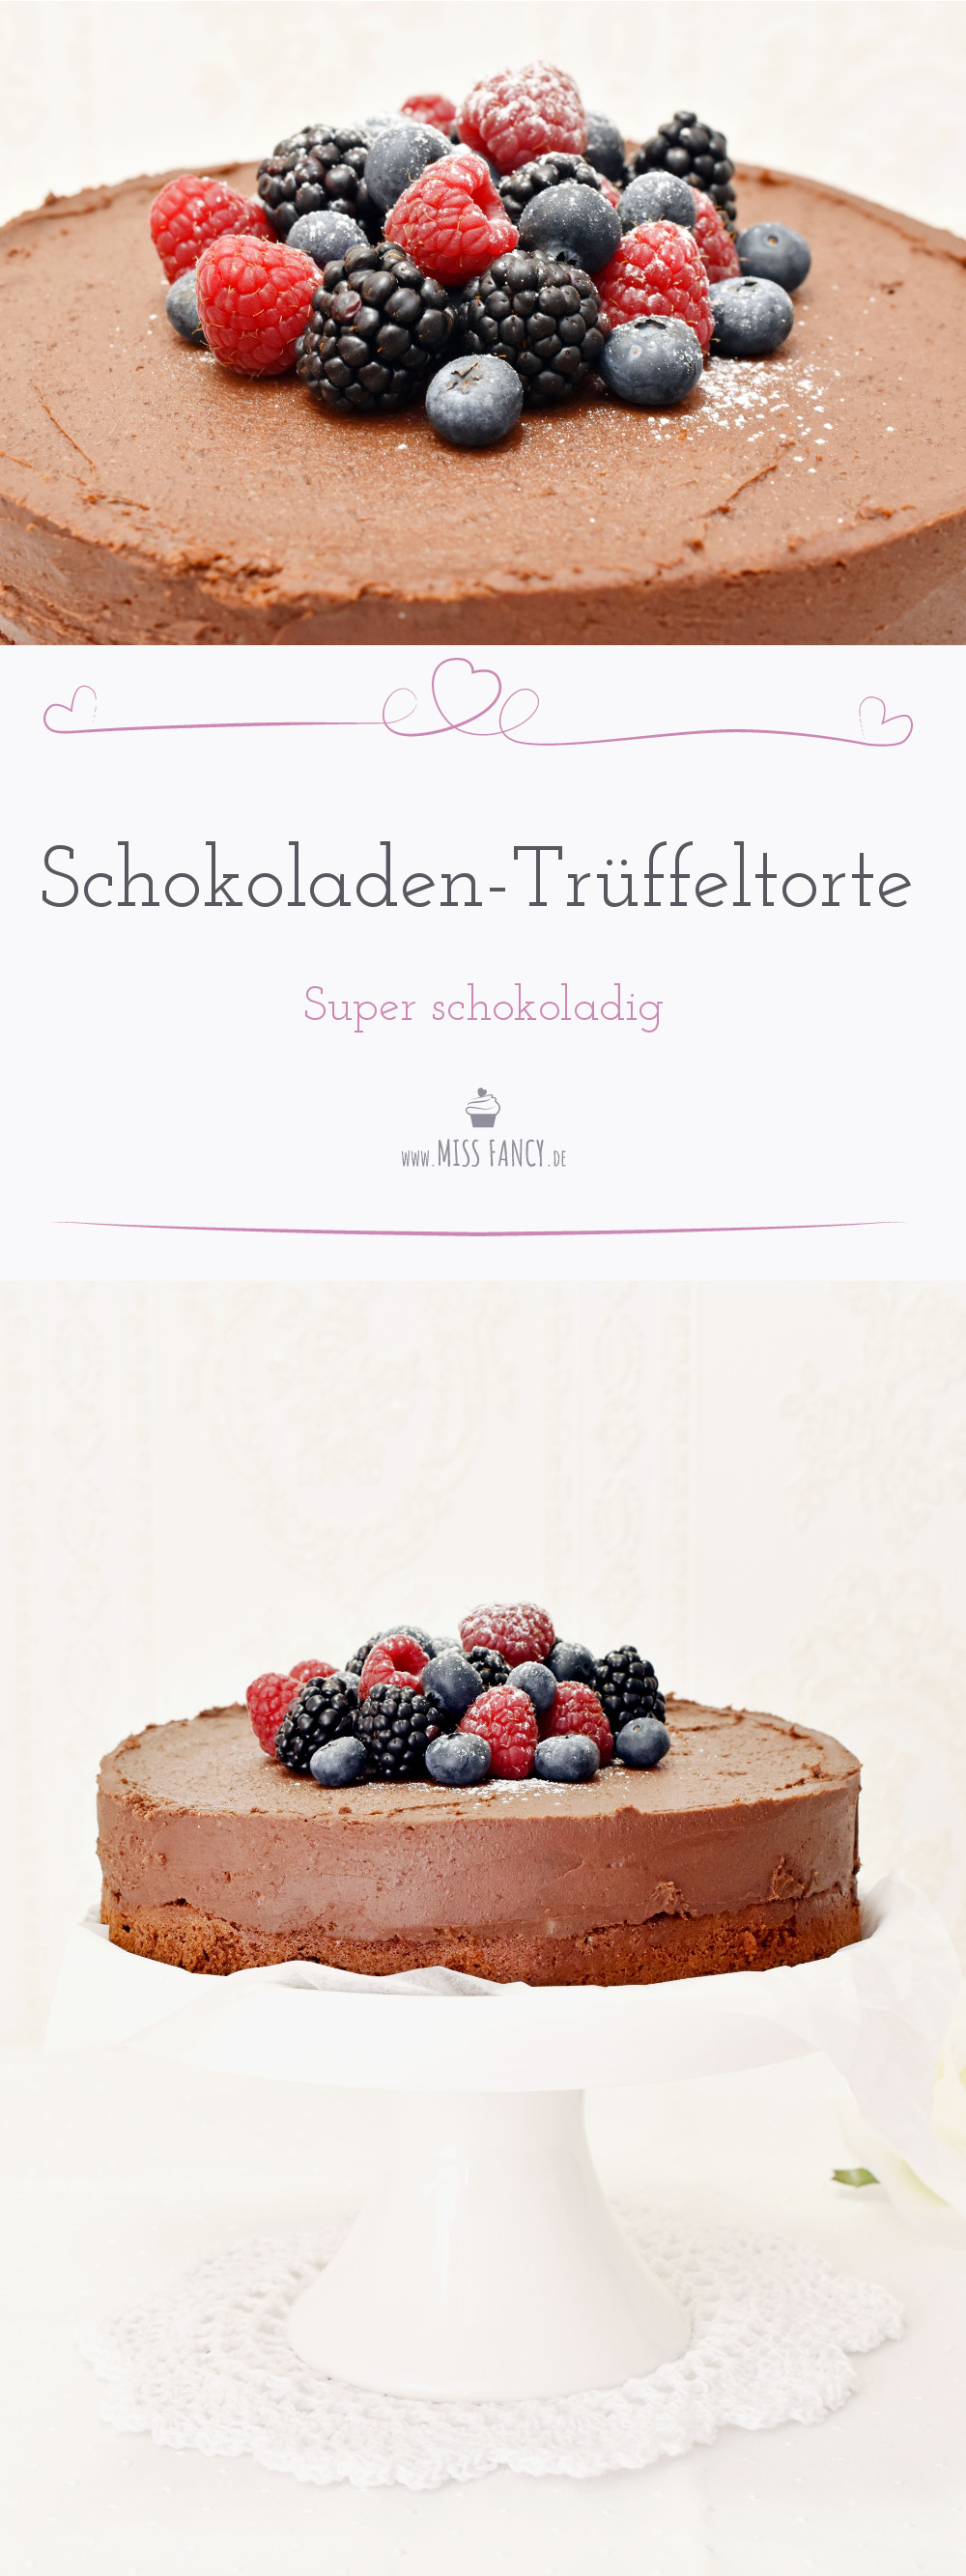 Rezept-Schokoladen-Trüffeltorte-Missfancy